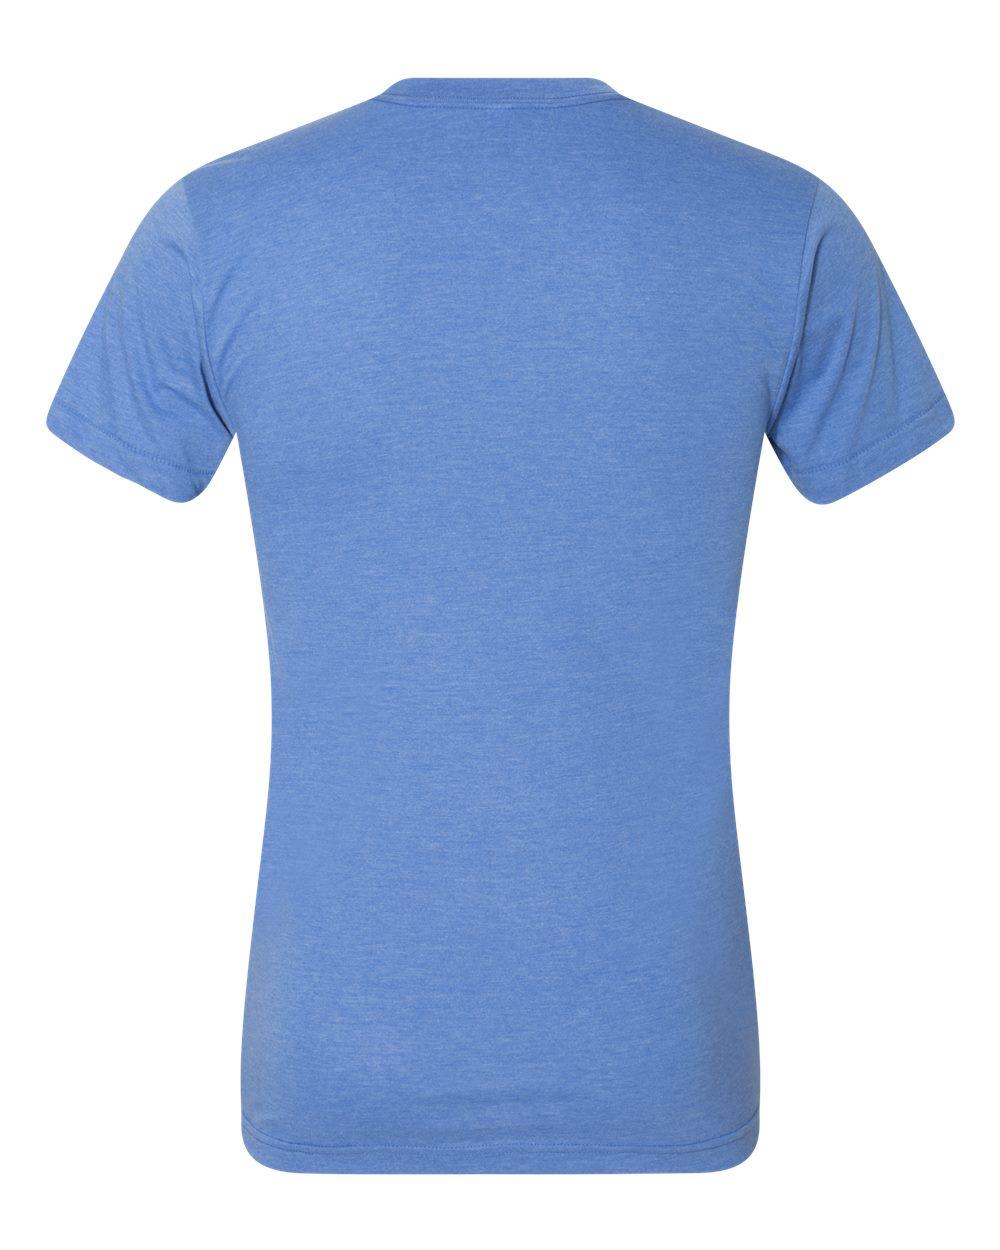 American-Apparel-Mens-Slim-Fit-50-50-Cotton-T-Shirt-Tee-BB401W-up-to-2XL thumbnail 28